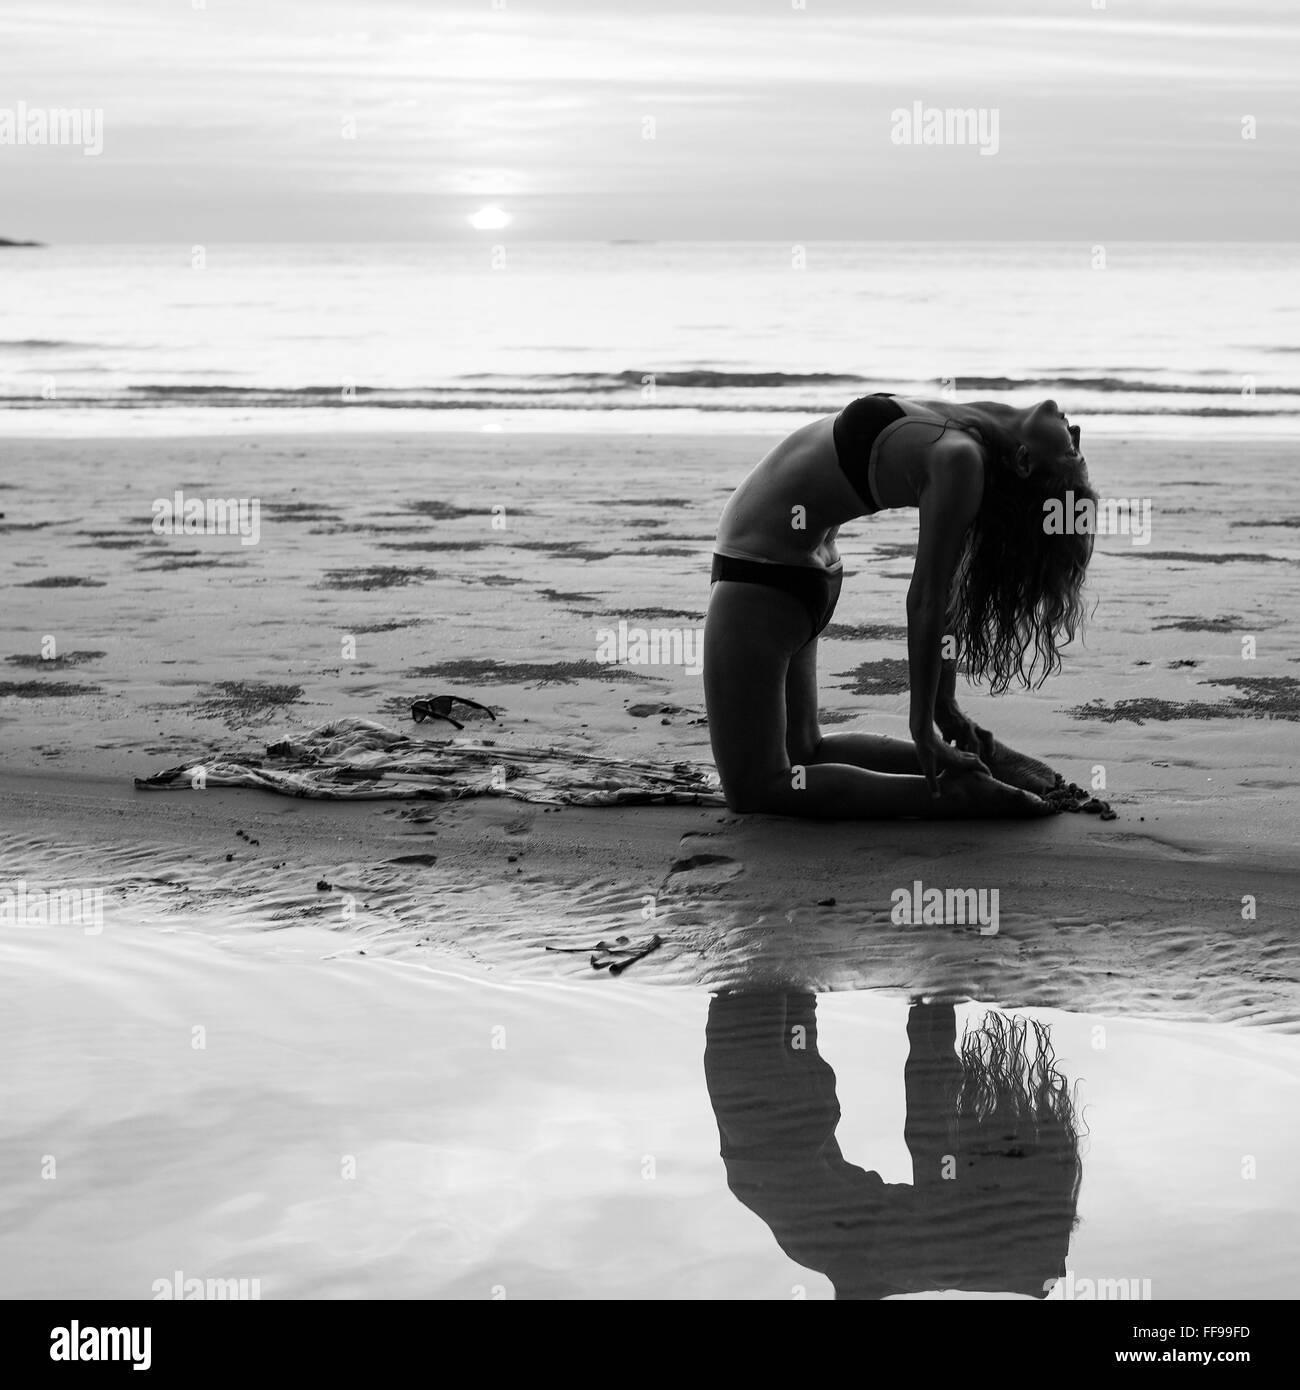 frau silhouette yoga bungen am strand bei sonnenuntergang schwarz wei fotografie stockfoto. Black Bedroom Furniture Sets. Home Design Ideas